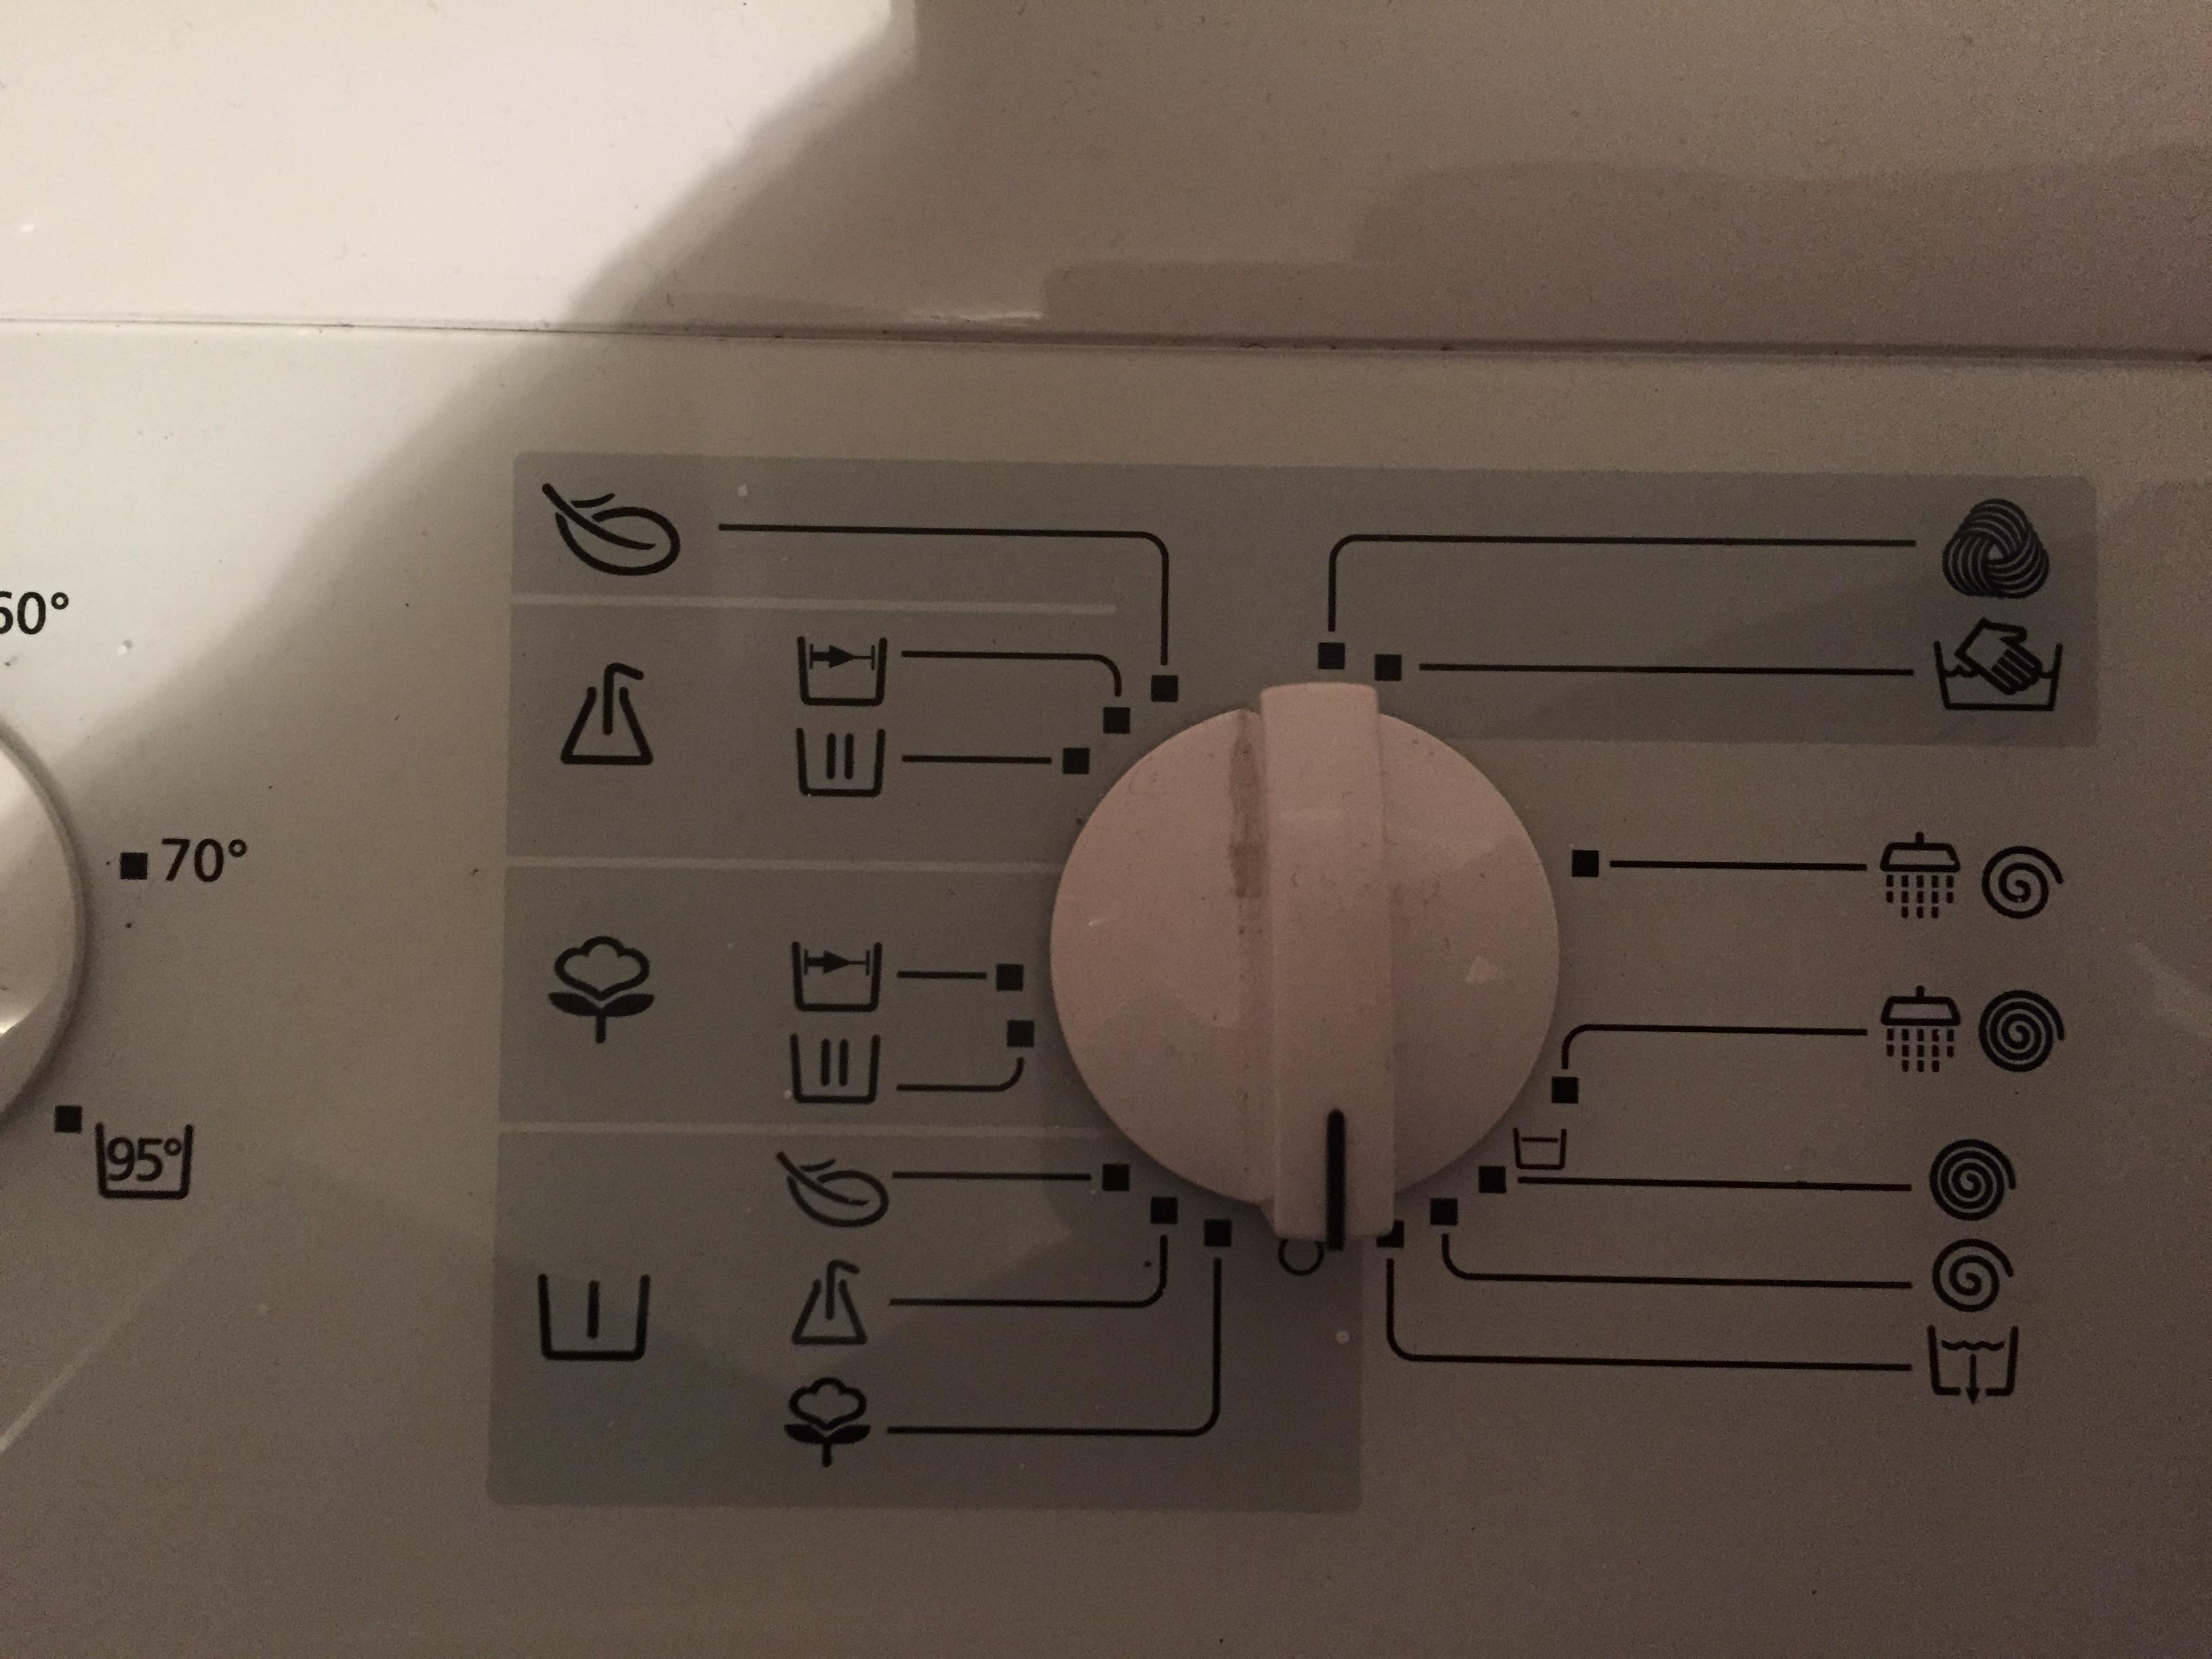 waschmaschine symbole bedeutung m bel design idee f r. Black Bedroom Furniture Sets. Home Design Ideas